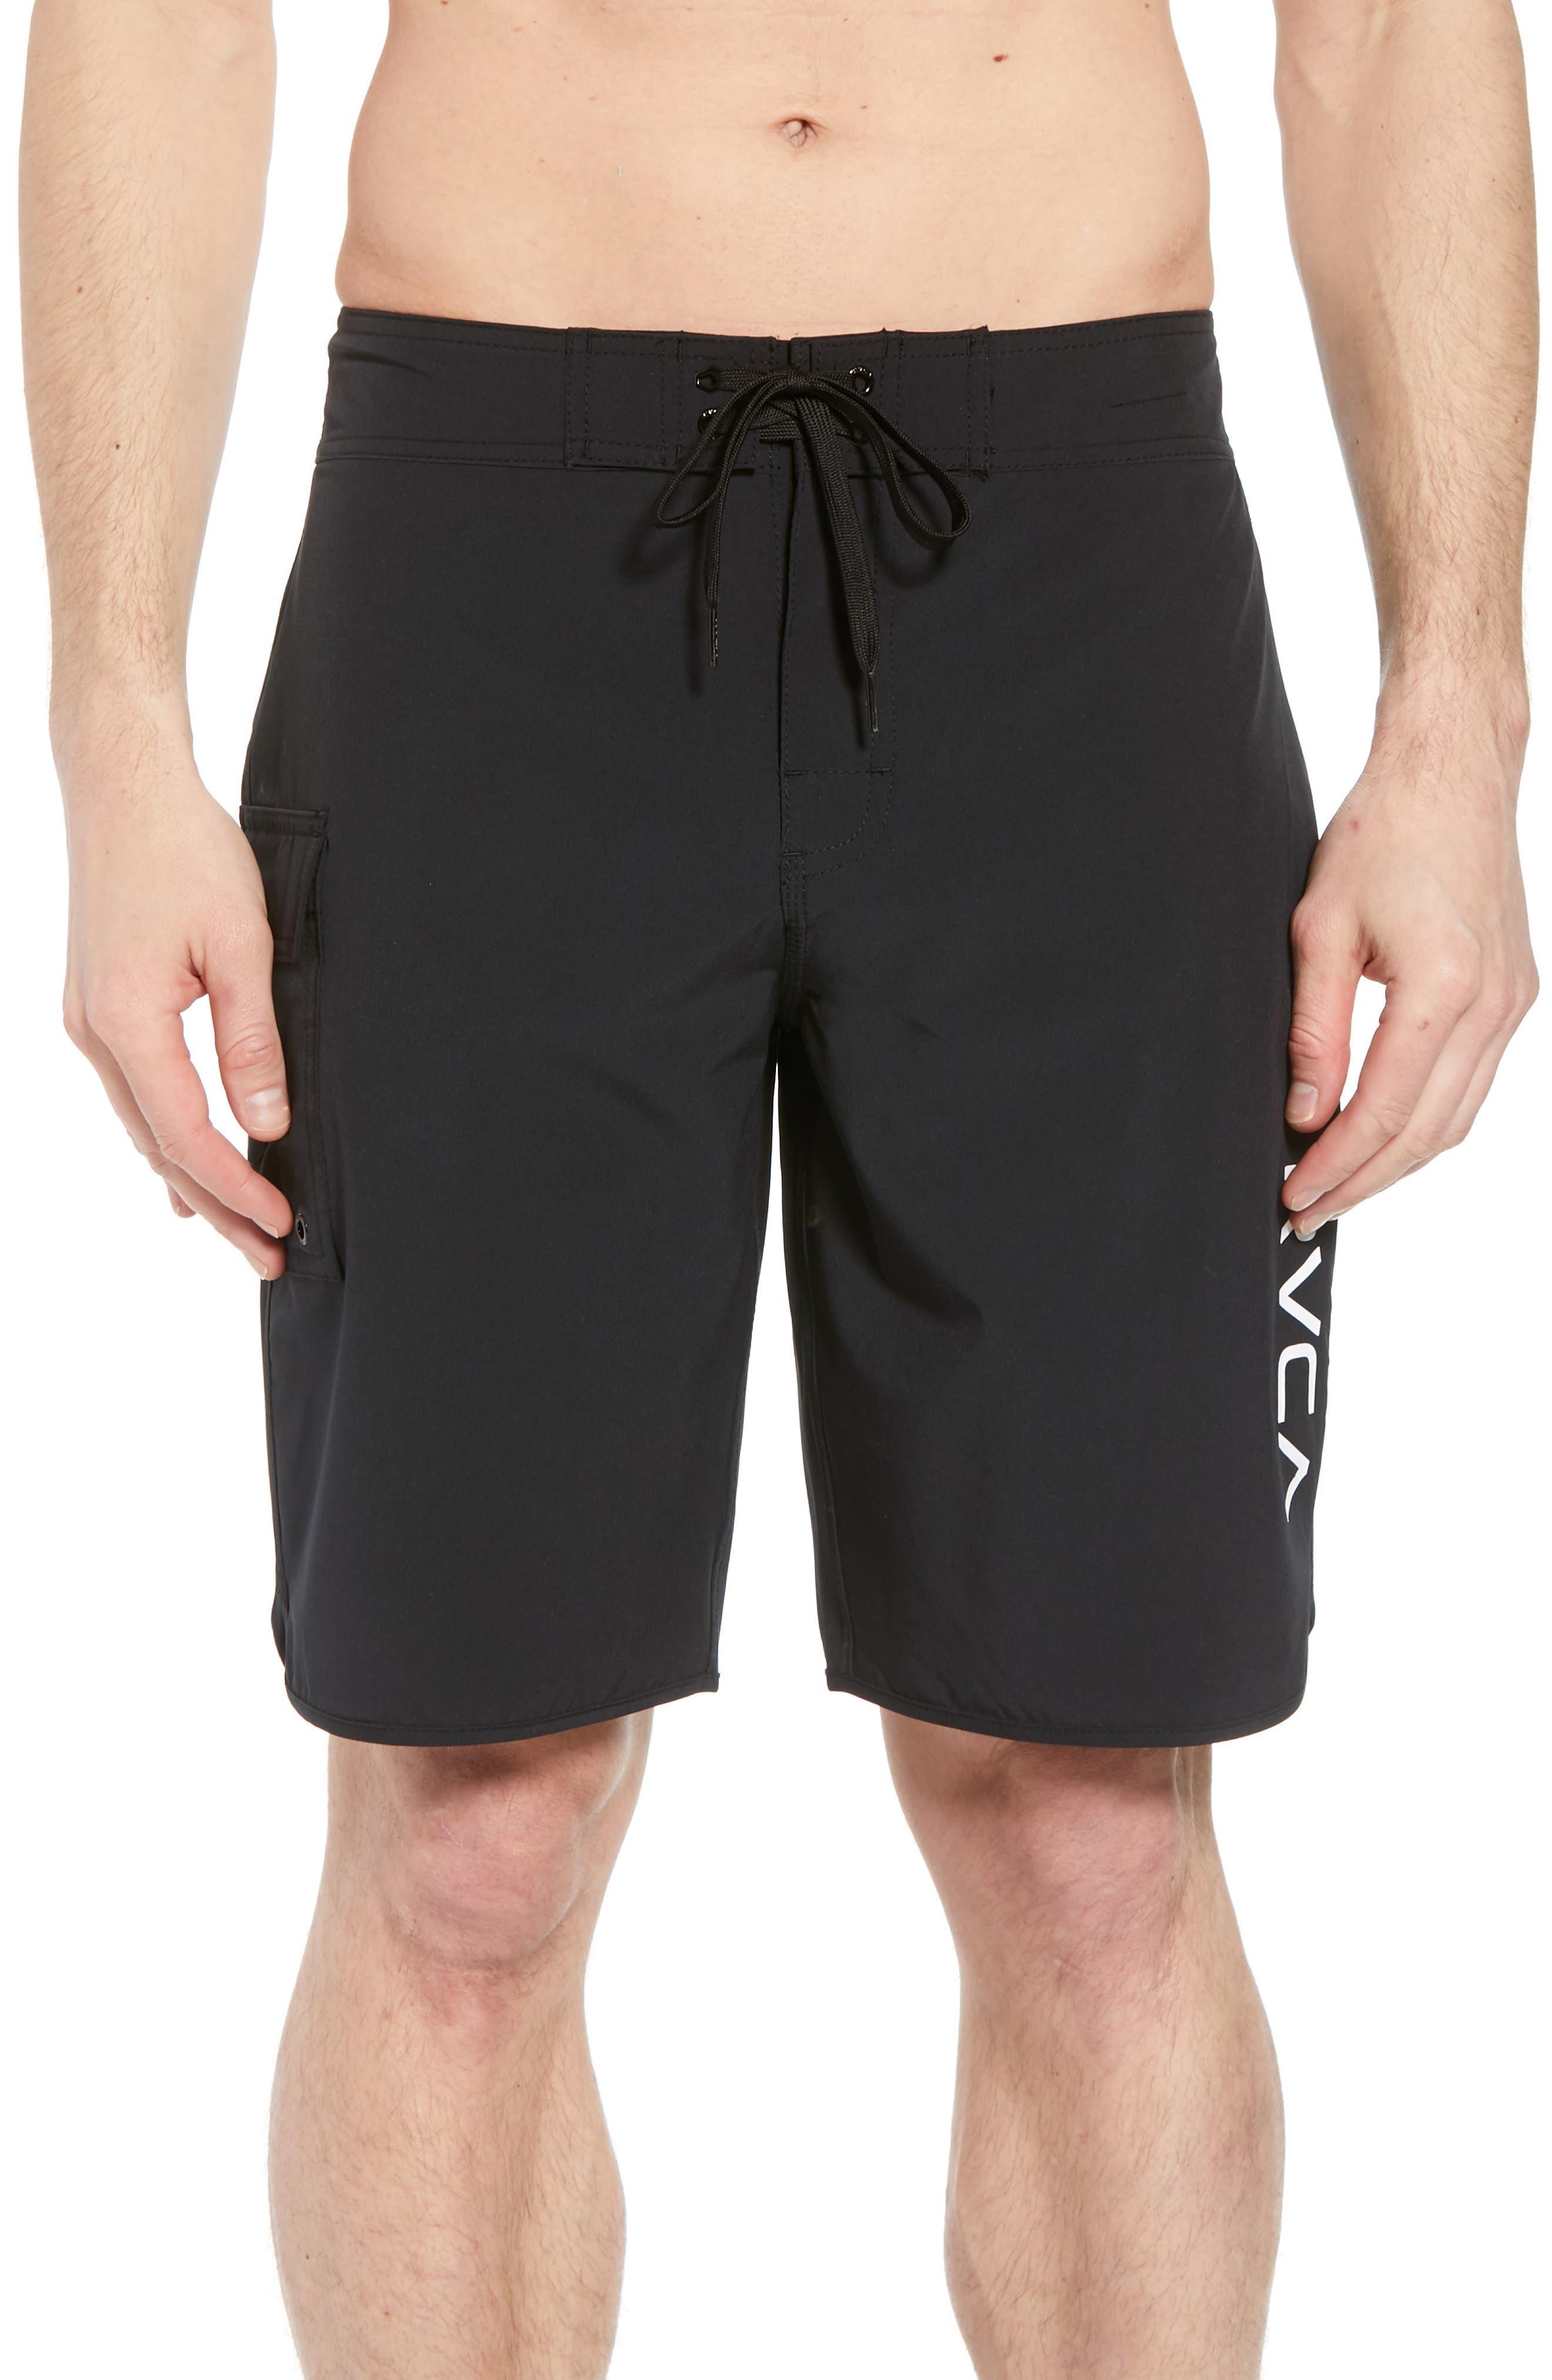 'Eastern' Scalloped Hem Board Shorts,                             Main thumbnail 1, color,                             All Black